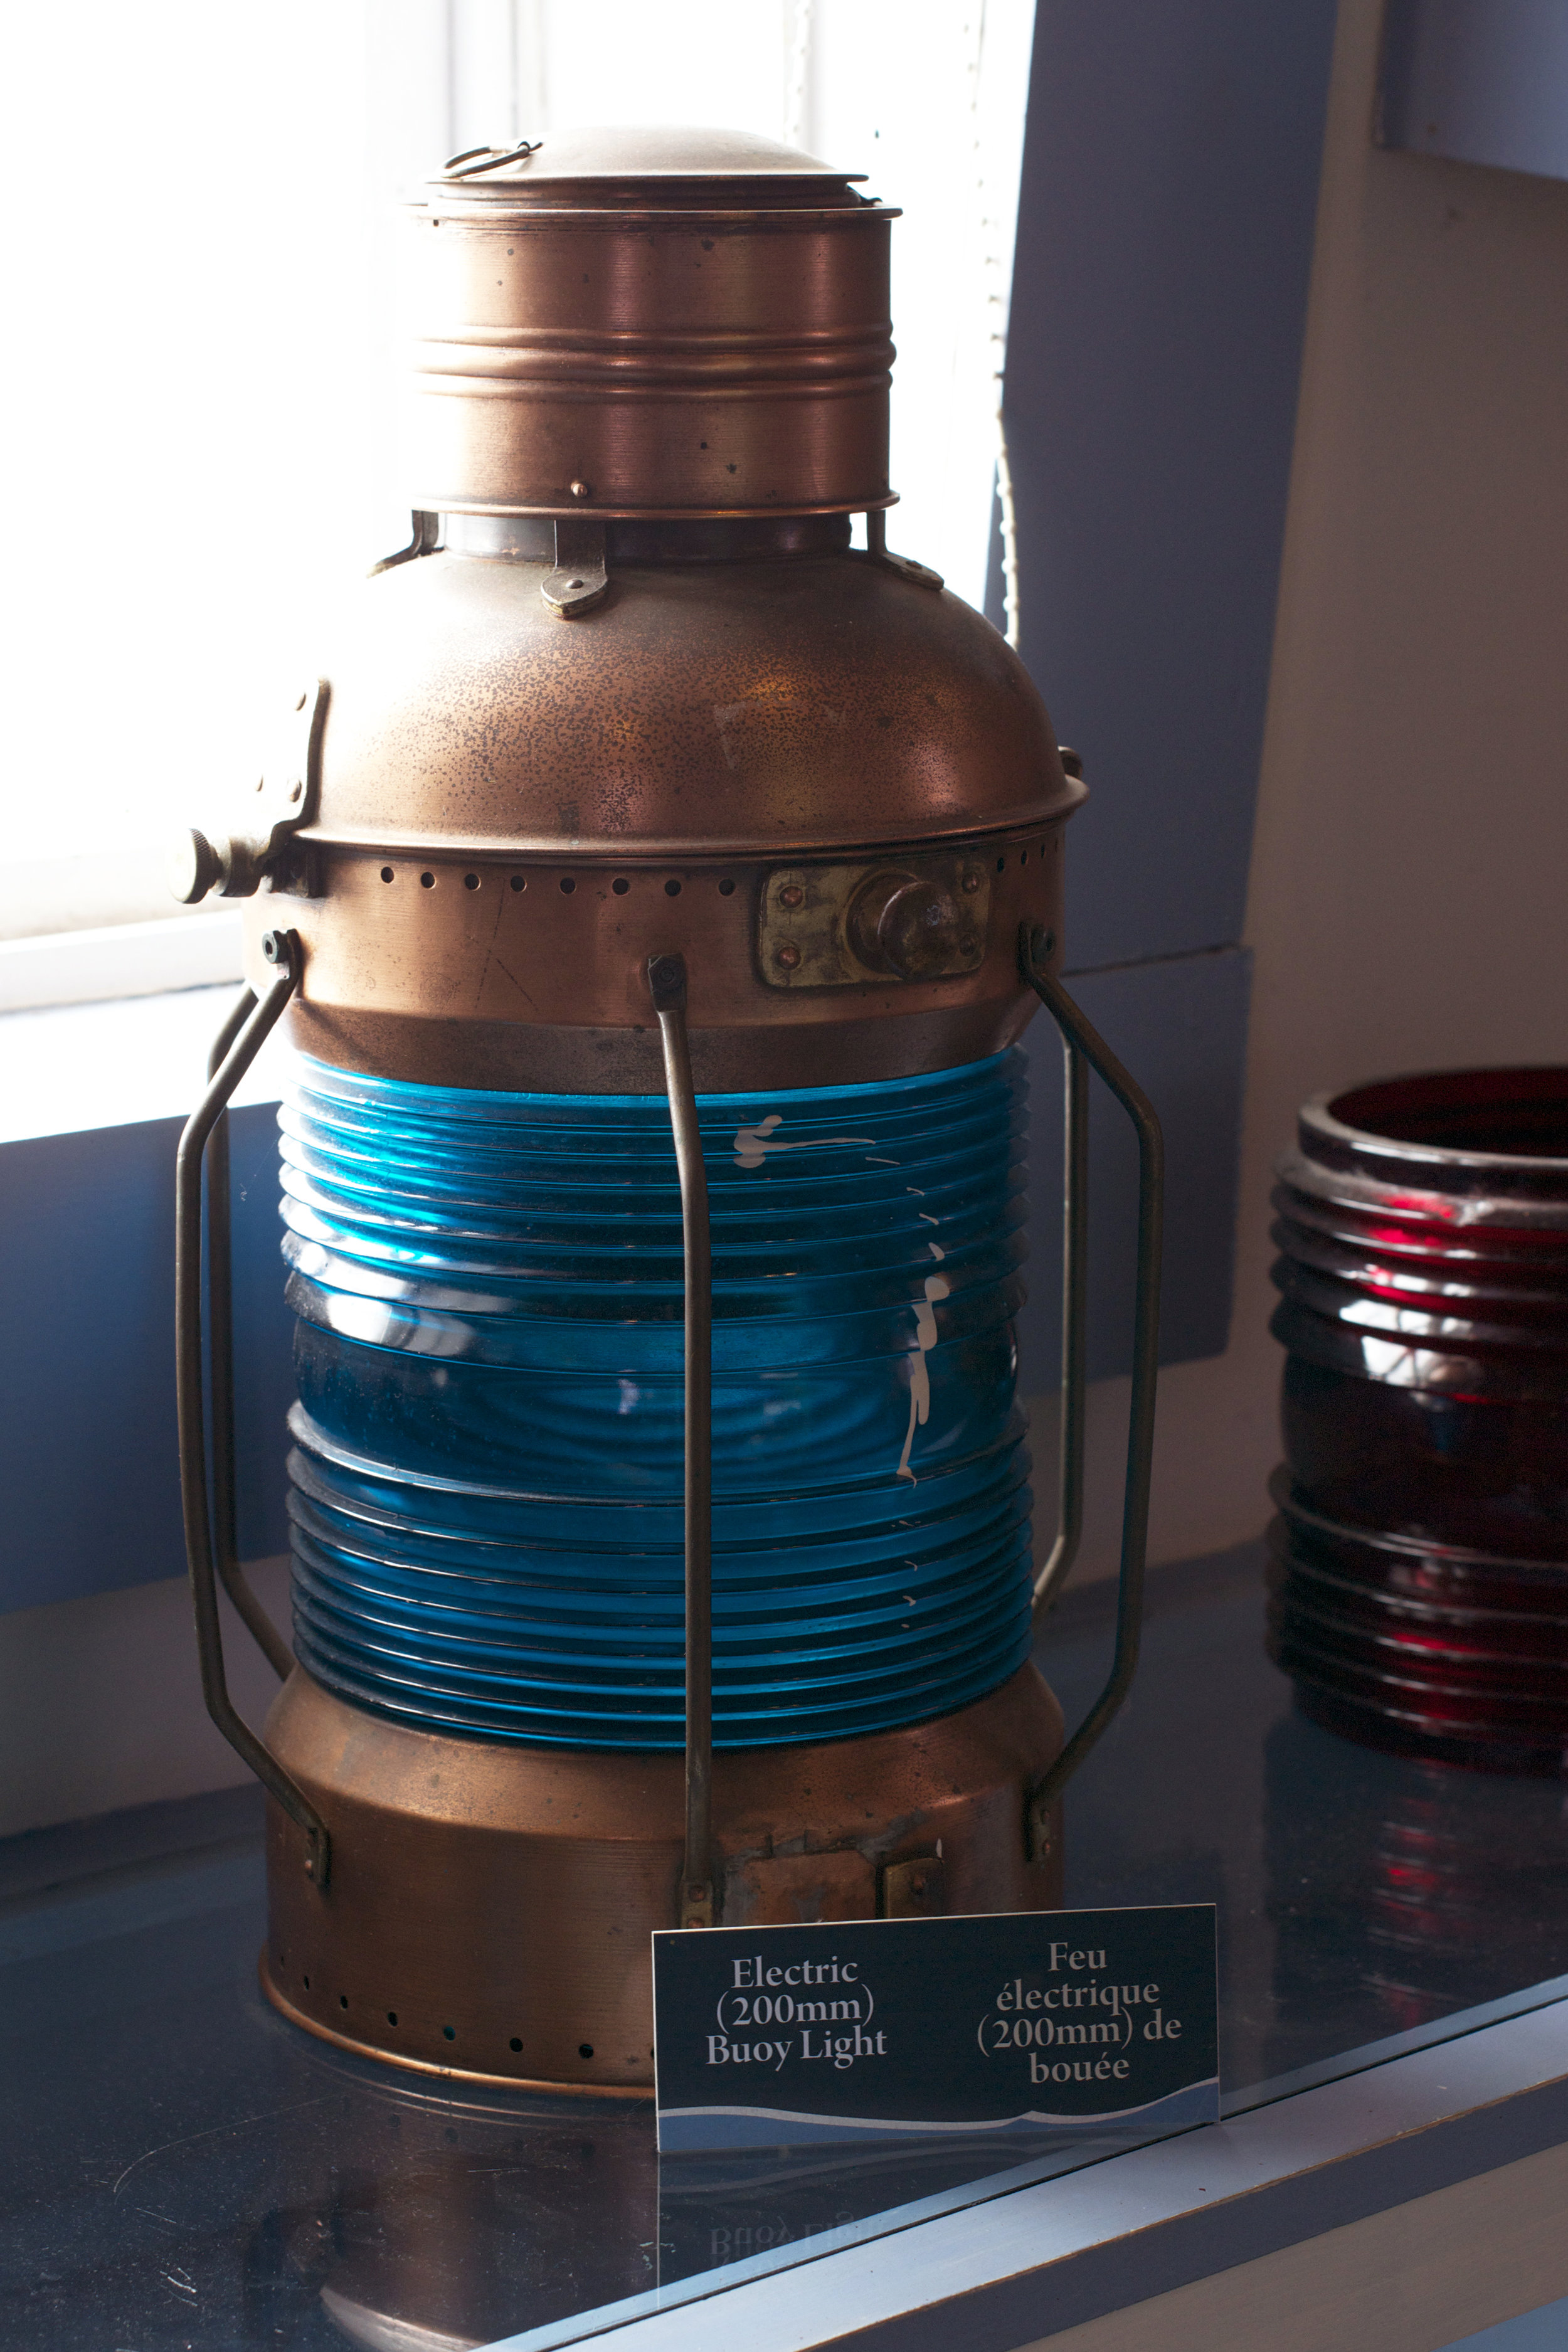 Electric-Buoy-Light.jpg